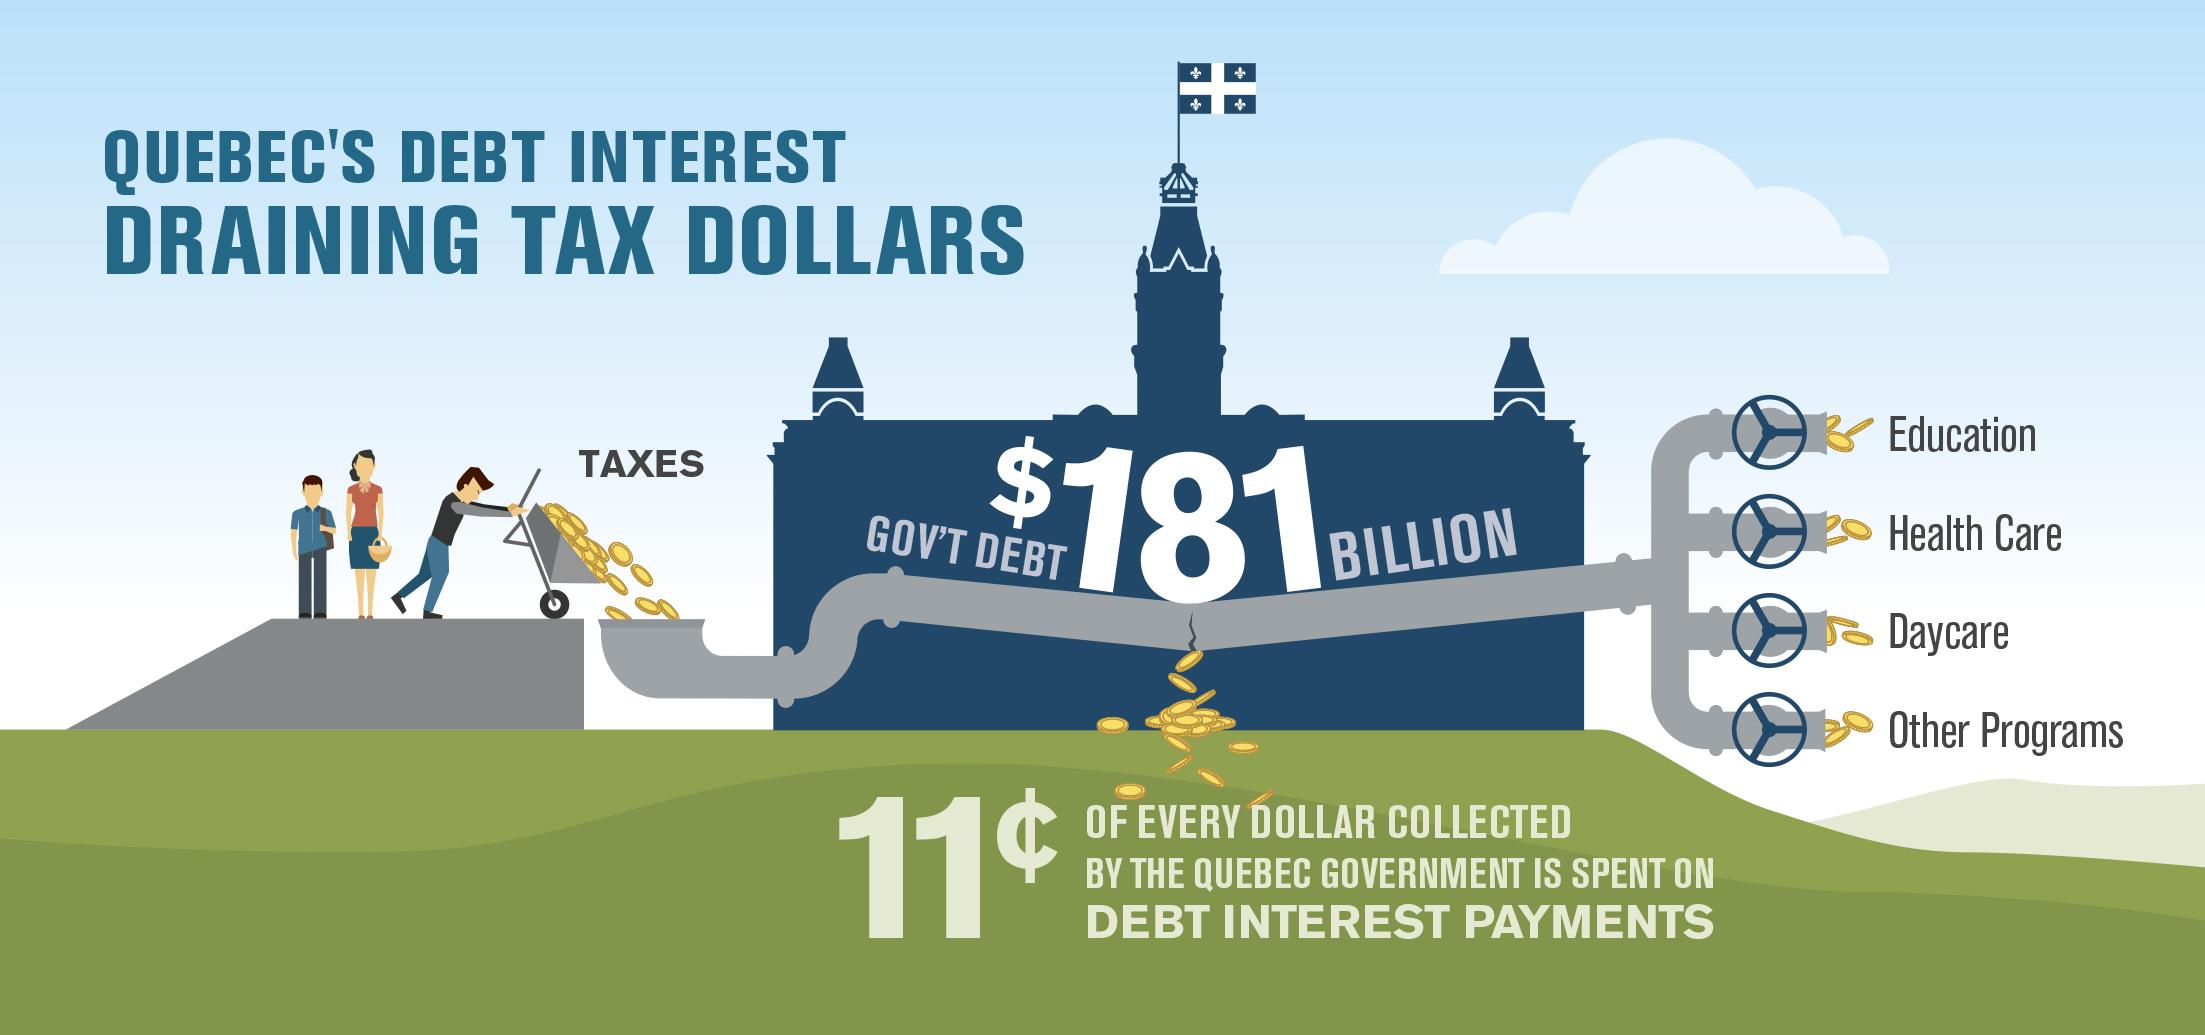 quebecs-debt-interest-draining-tax-dollars-infographic.jpg | Fraser ...